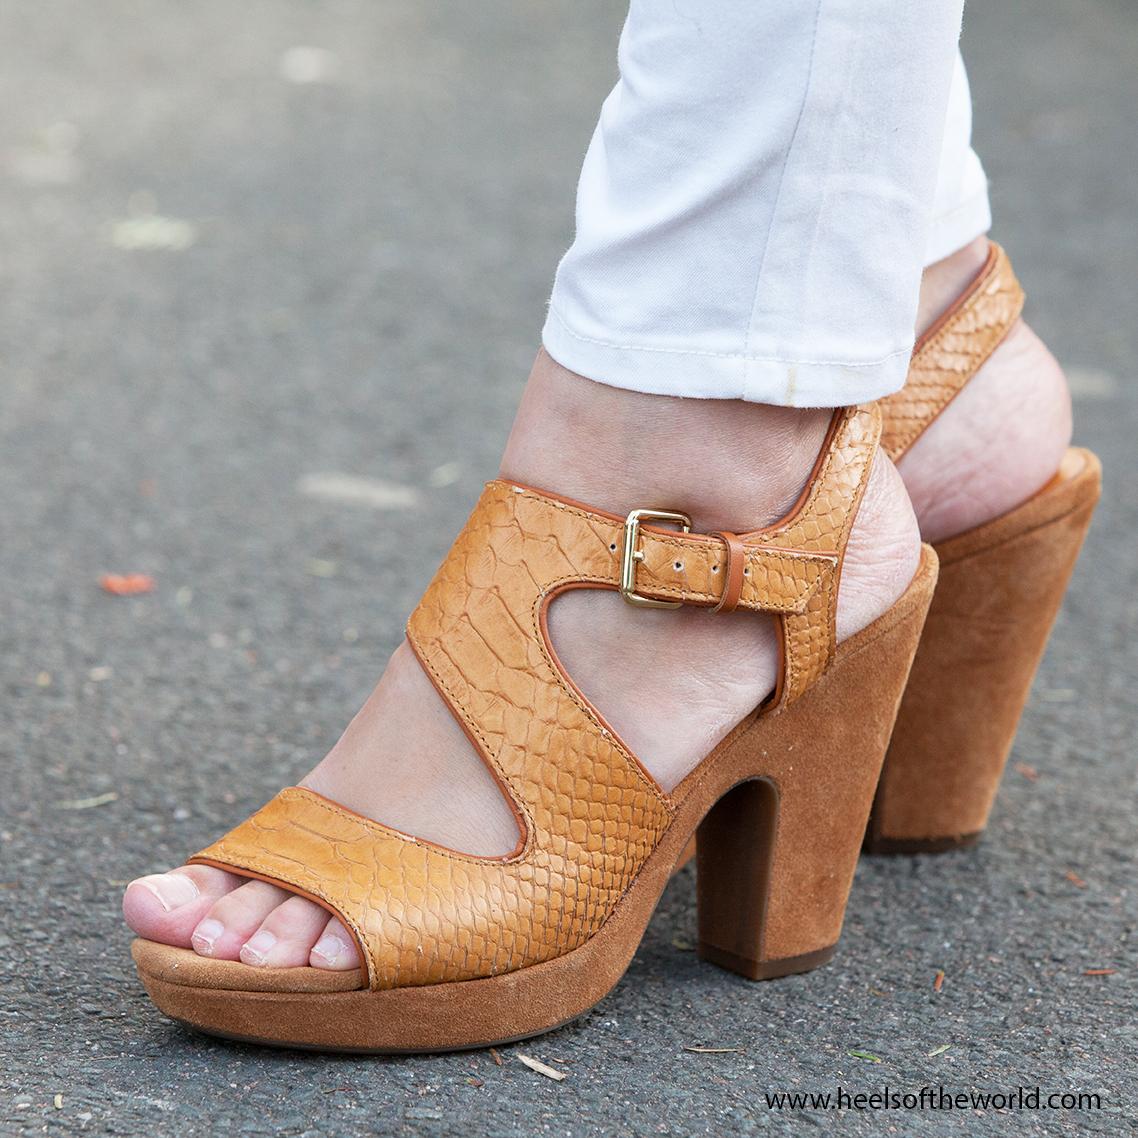 Dutch heels. High heels photography at street. Photography at Straattheater Lansingerland in Bergschenhoek. Brand: Geox.